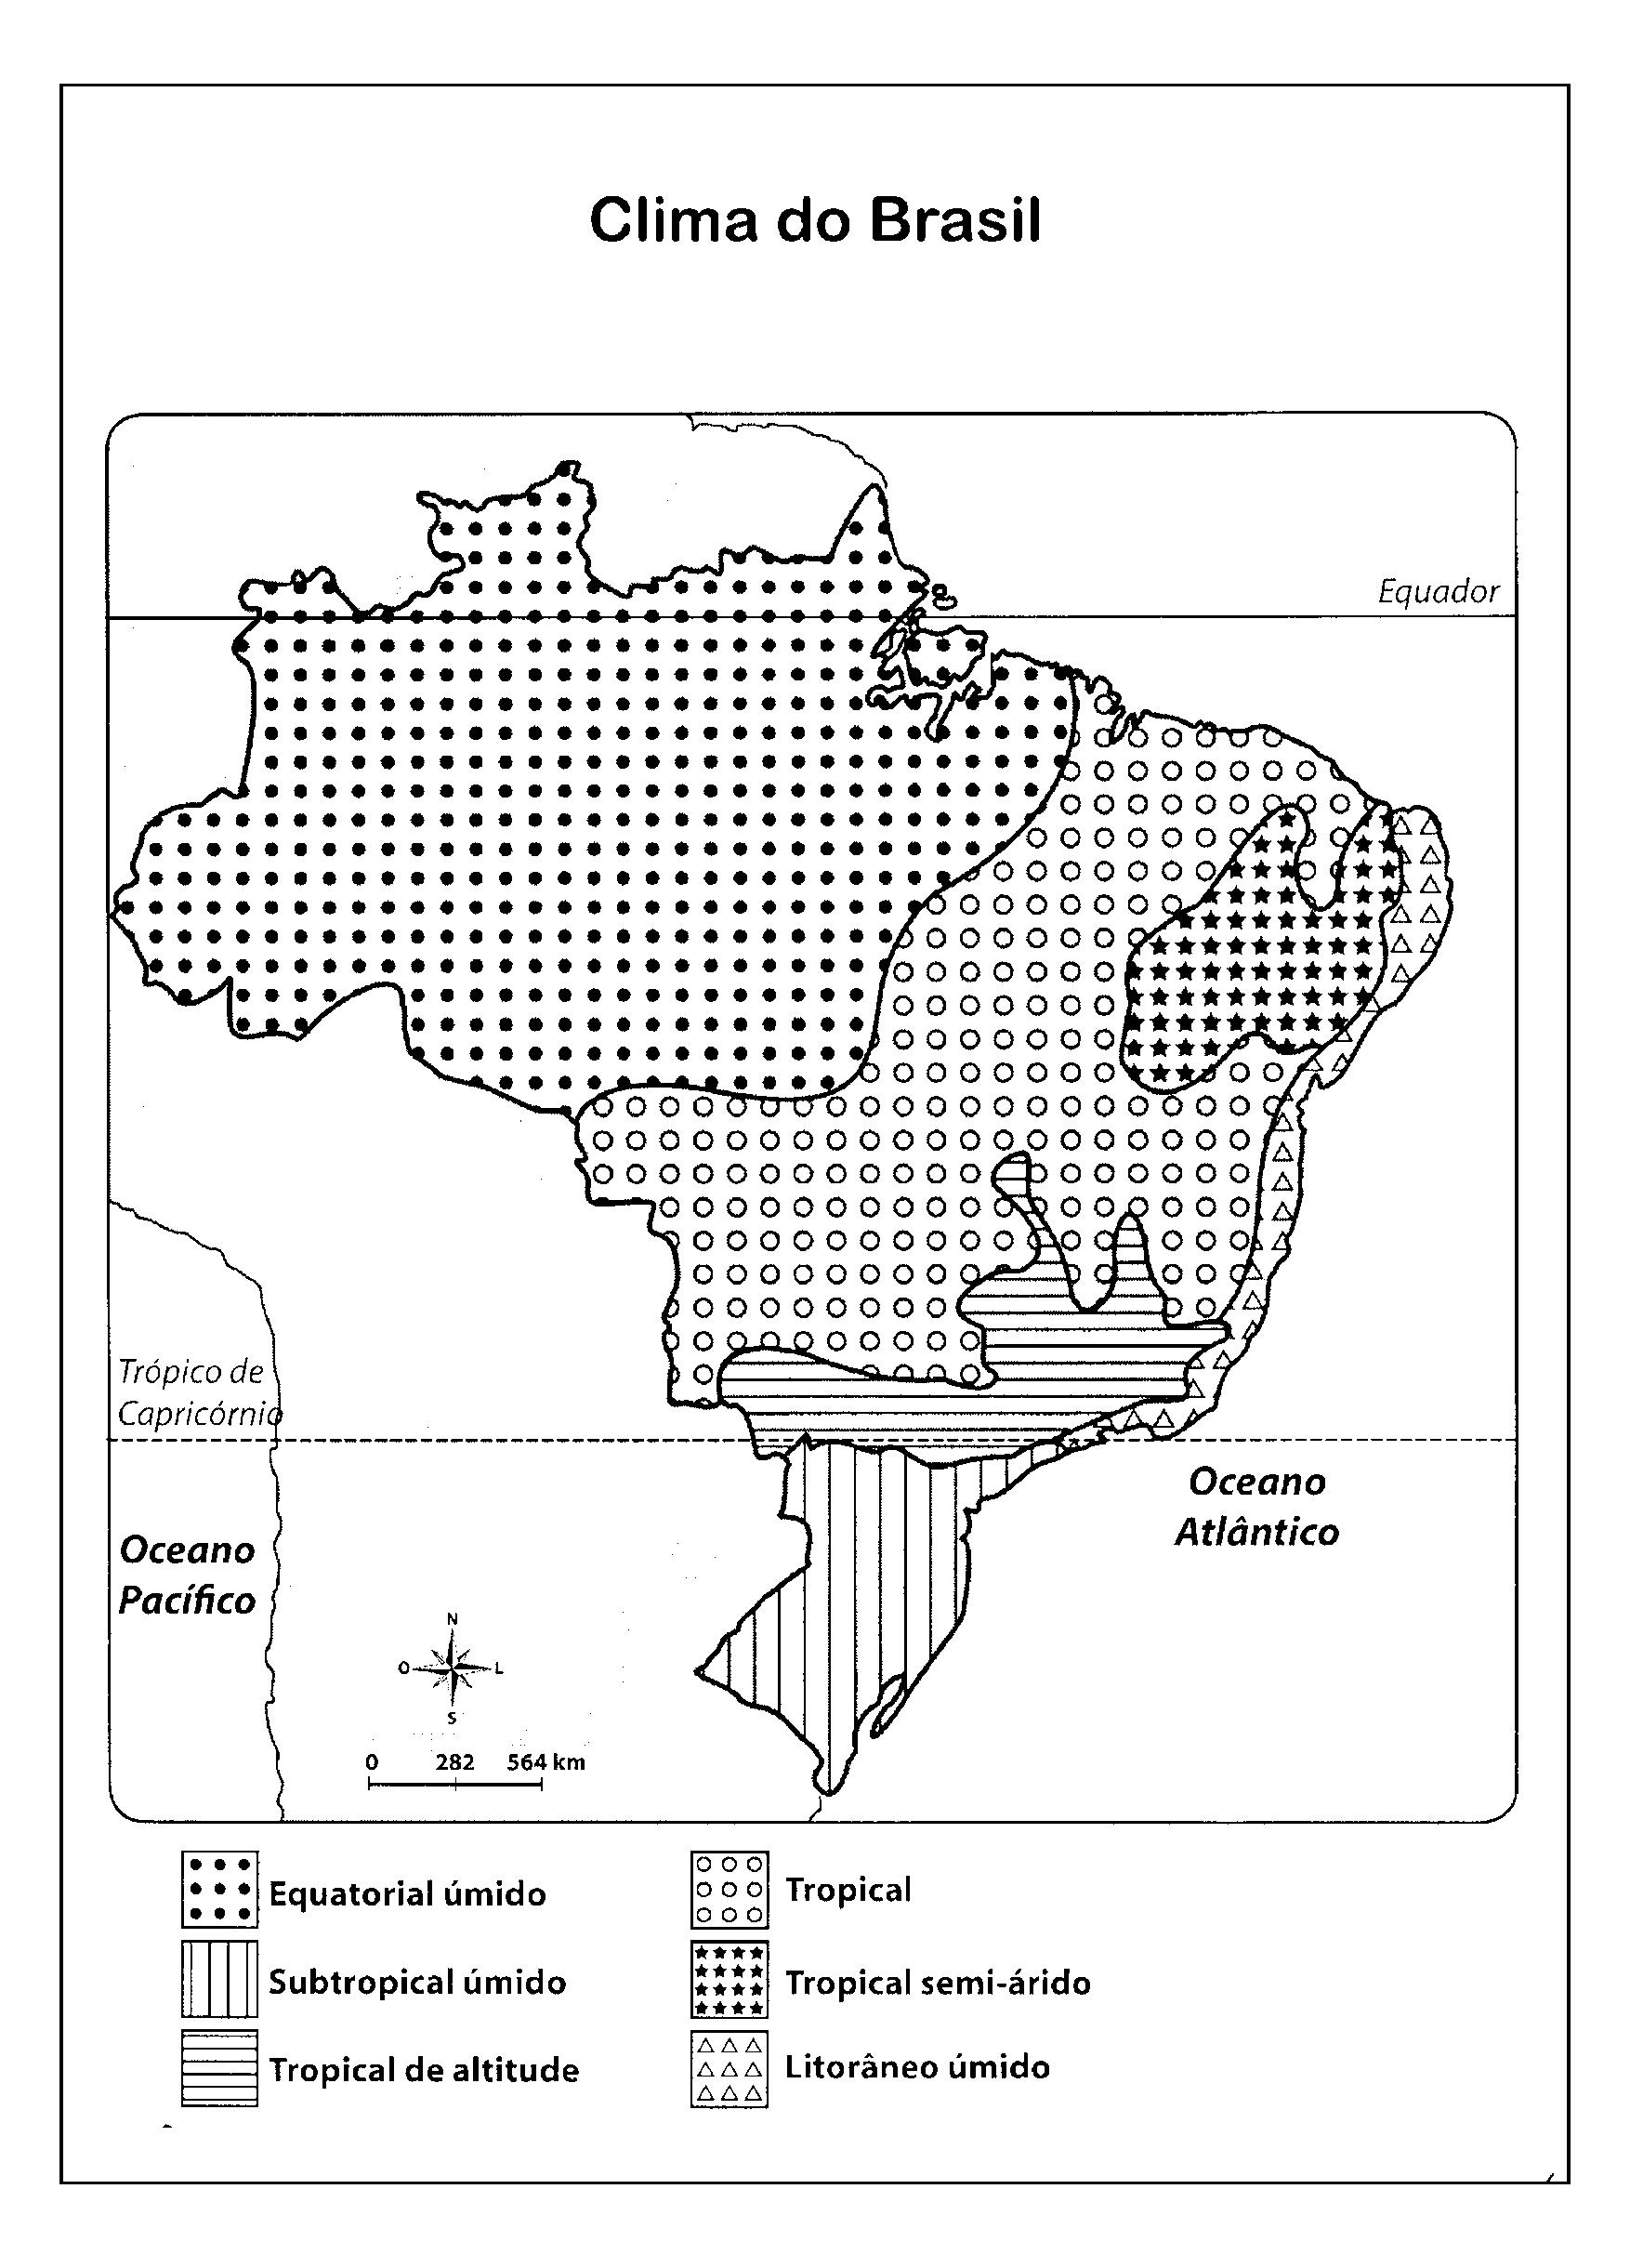 Mapa das Bacias Hidrográficas do Brasil